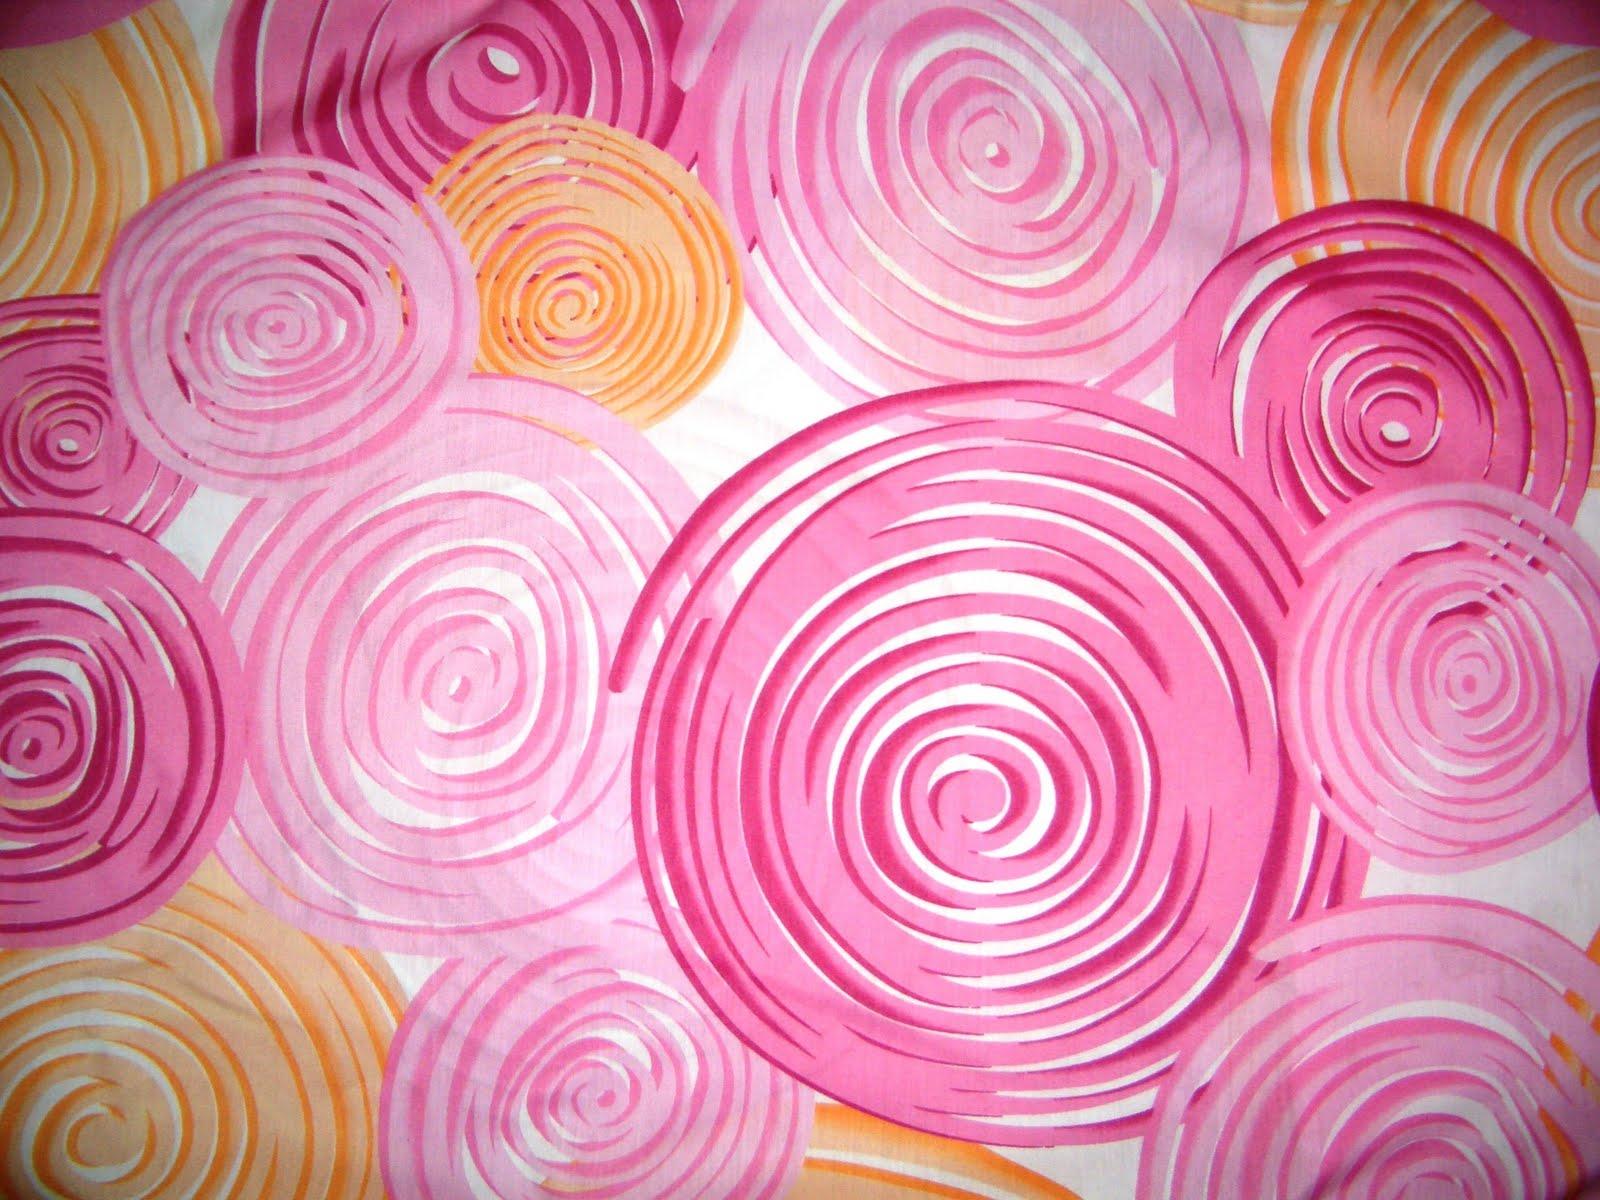 gambar corak abstrak related - photo #22